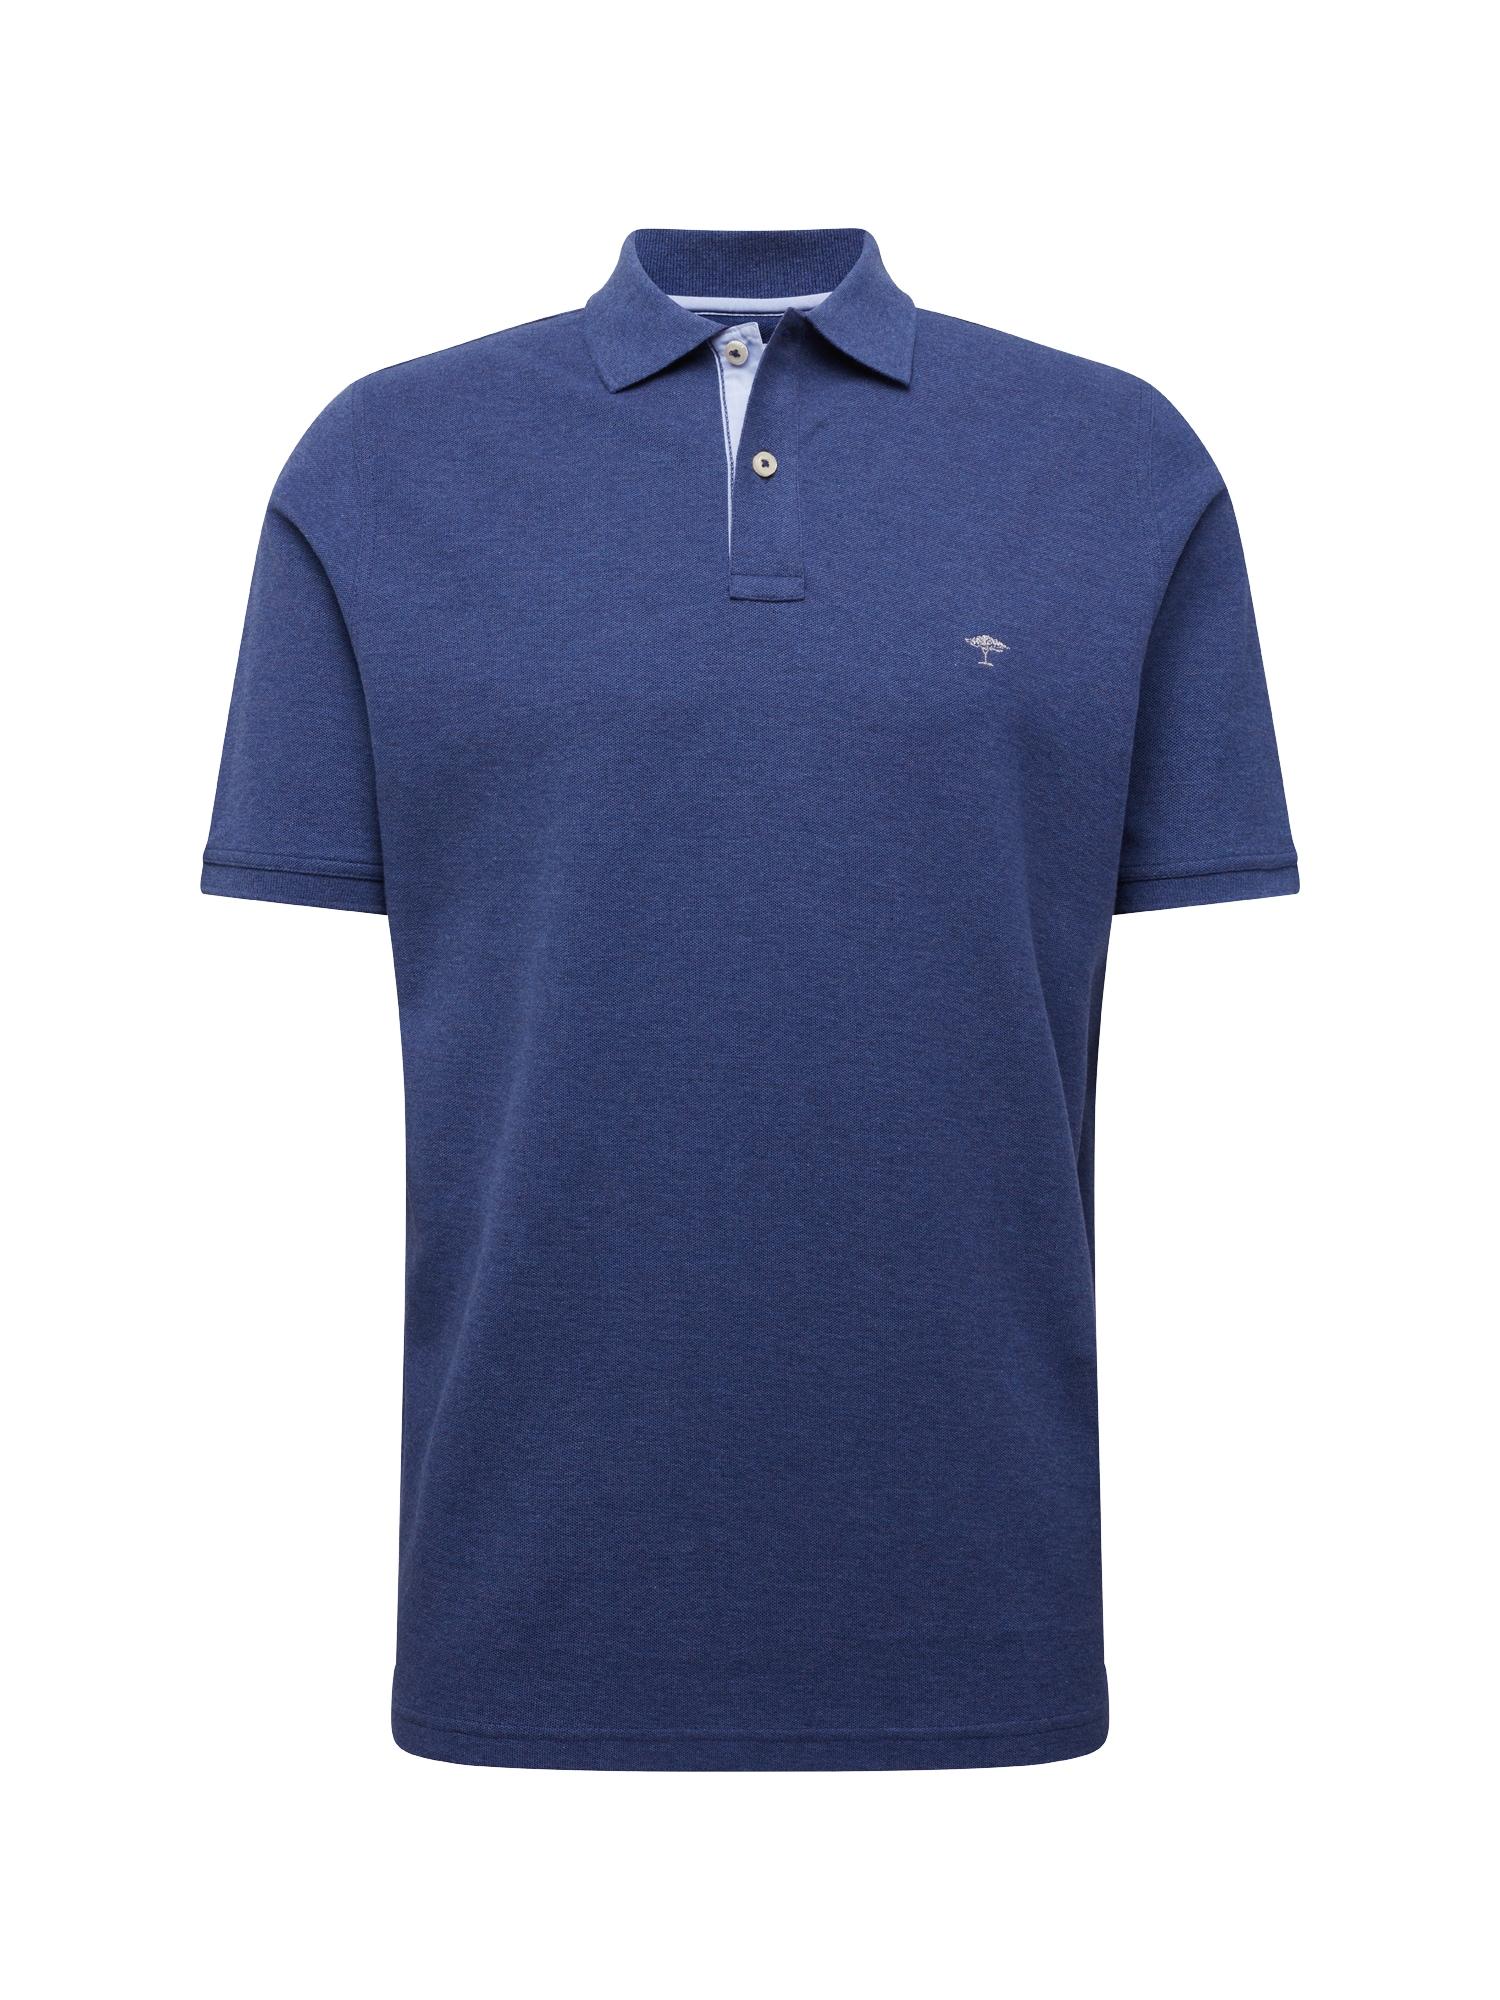 Tričko Polo Melange tmavě modrá FYNCH-HATTON